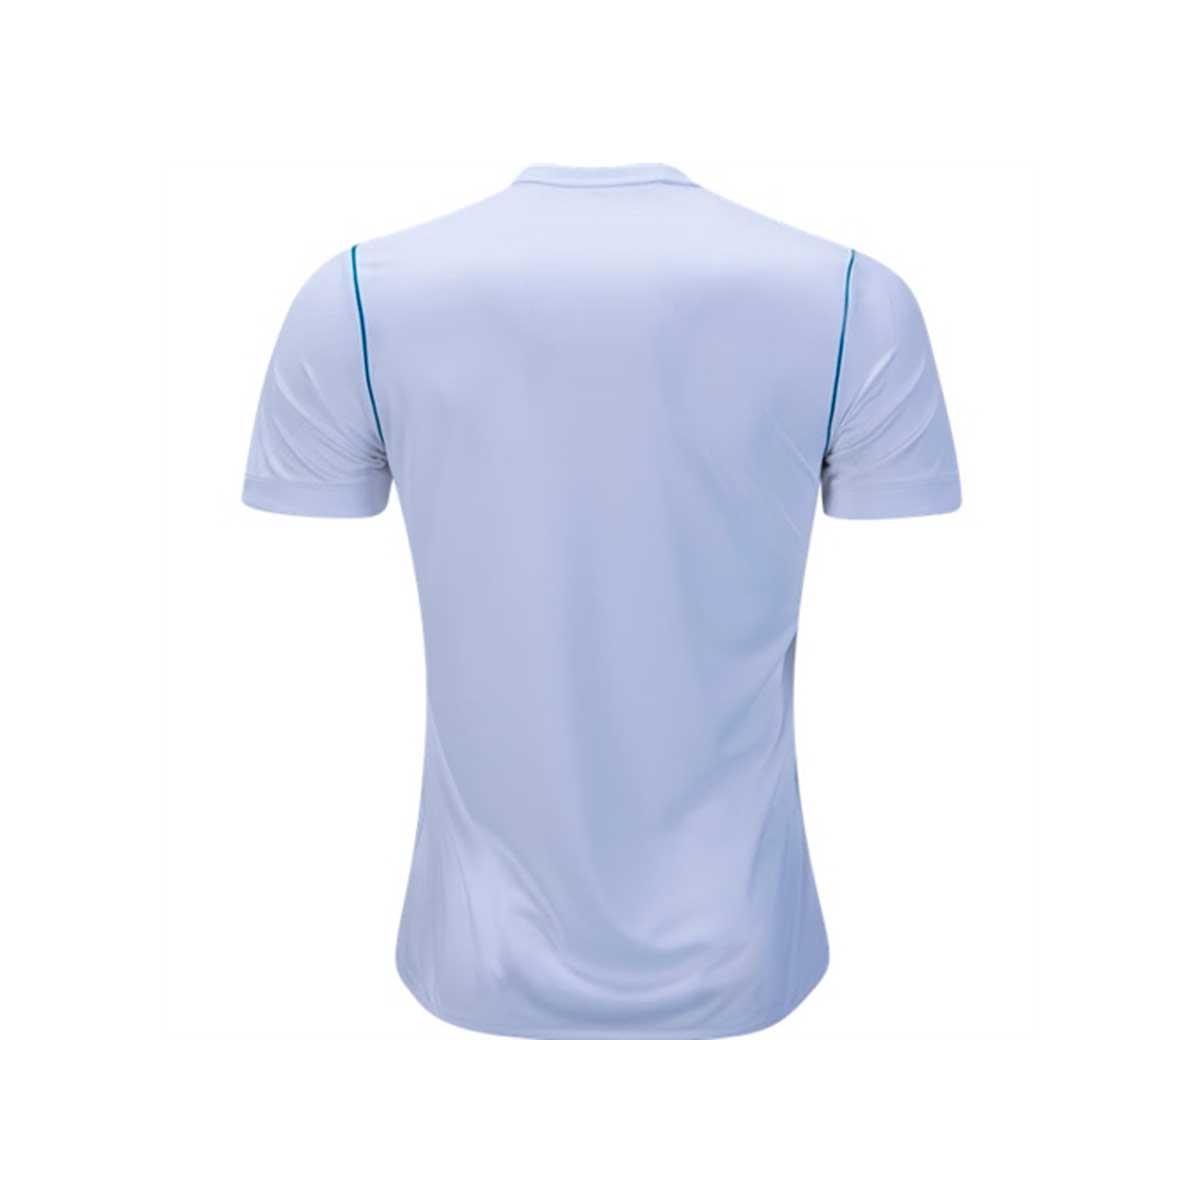 a77bcf31b77 Camisa Adidas Real Madrid I 2017 2018